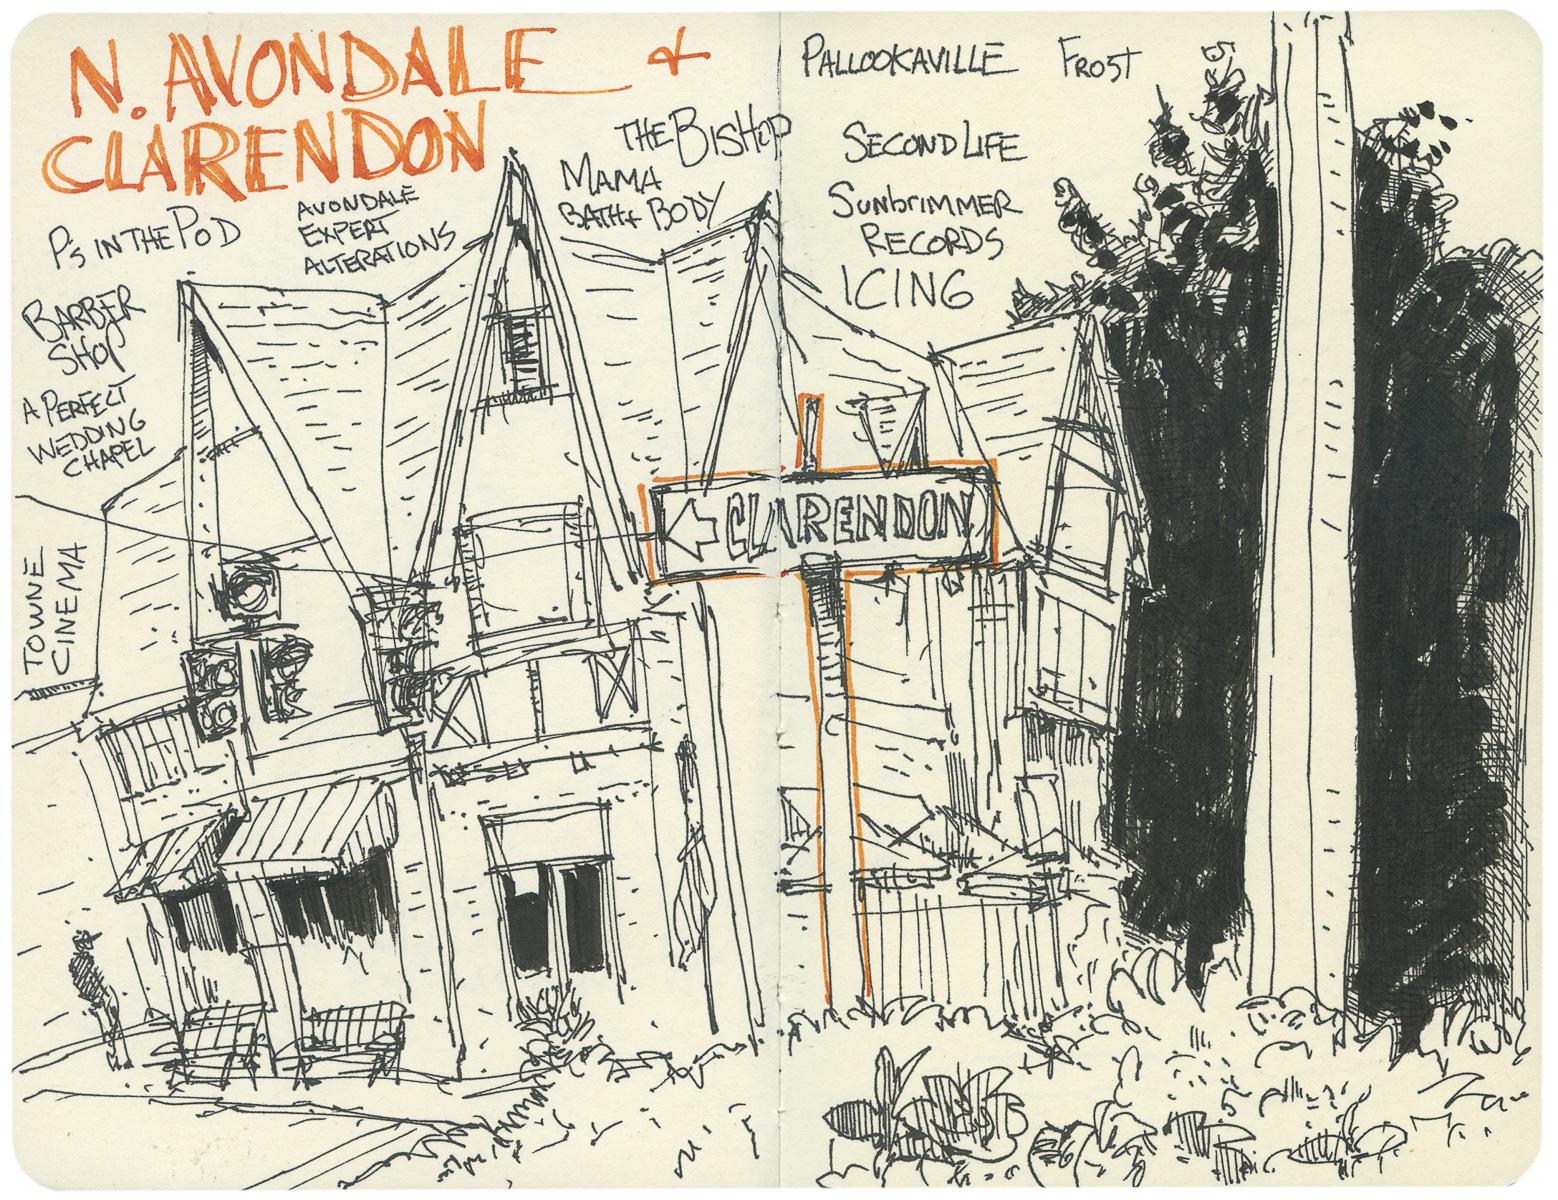 N. Avondale & Clarendon